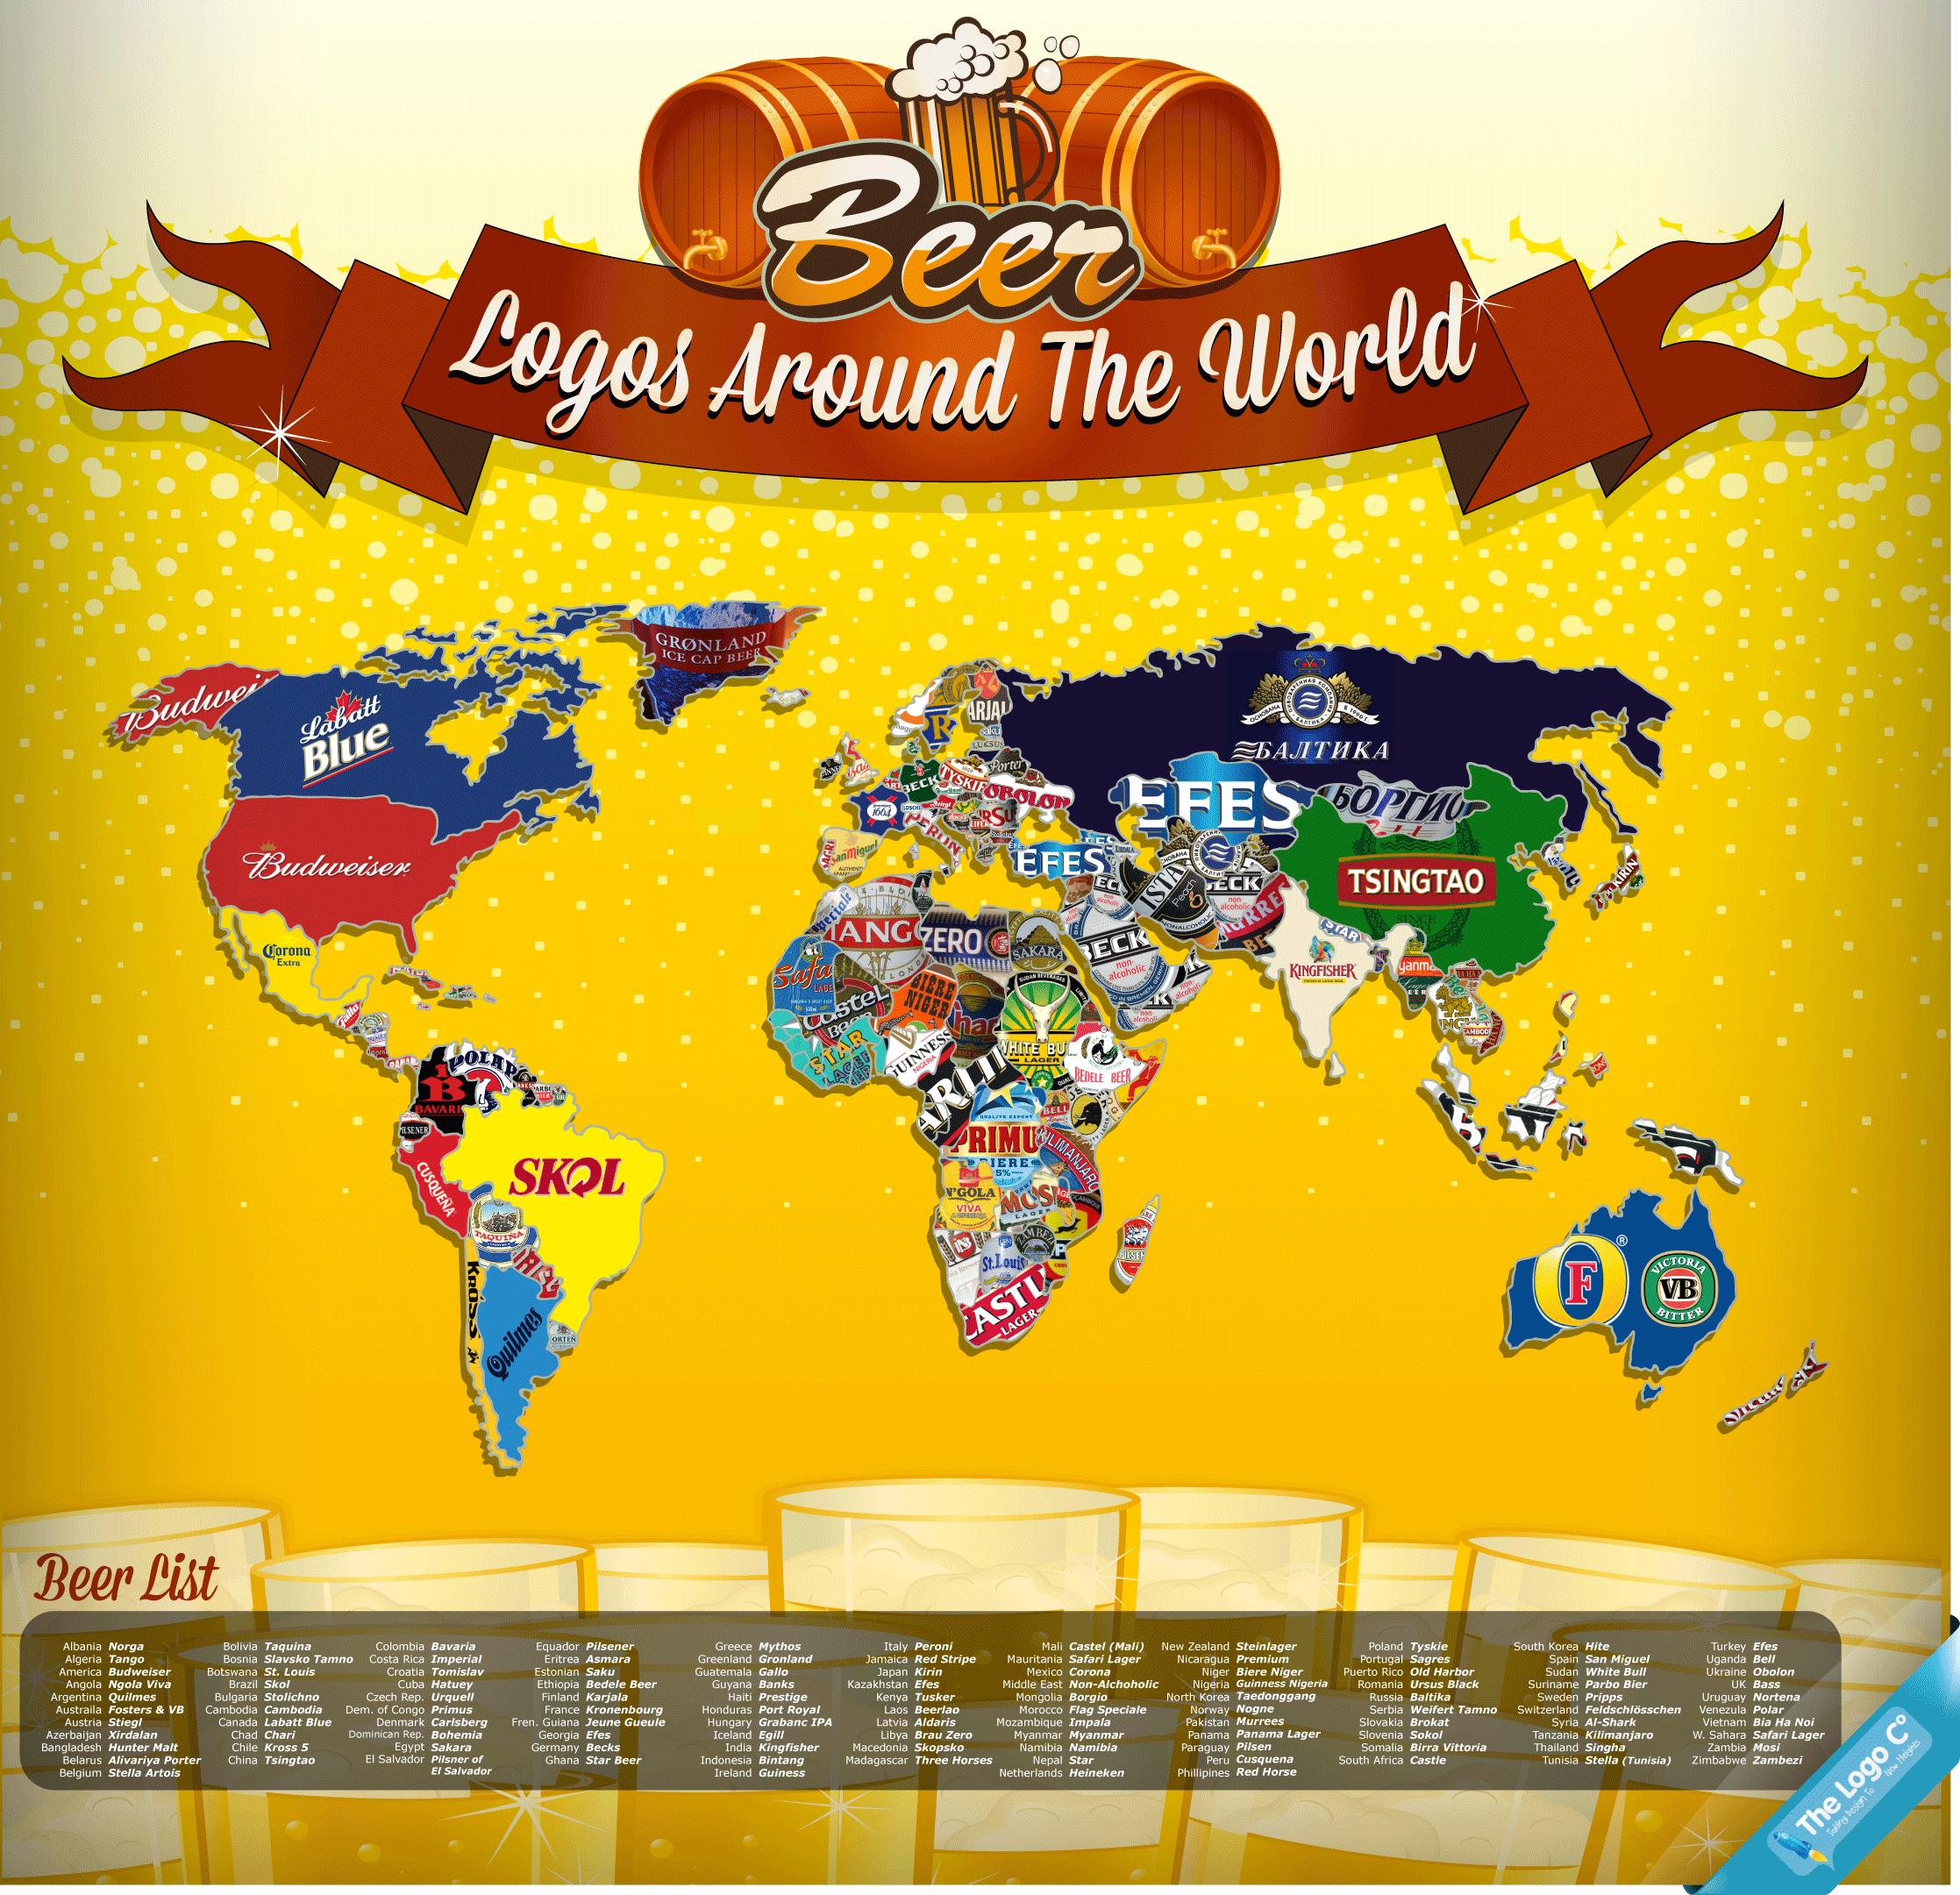 Beer Logos Around The World.